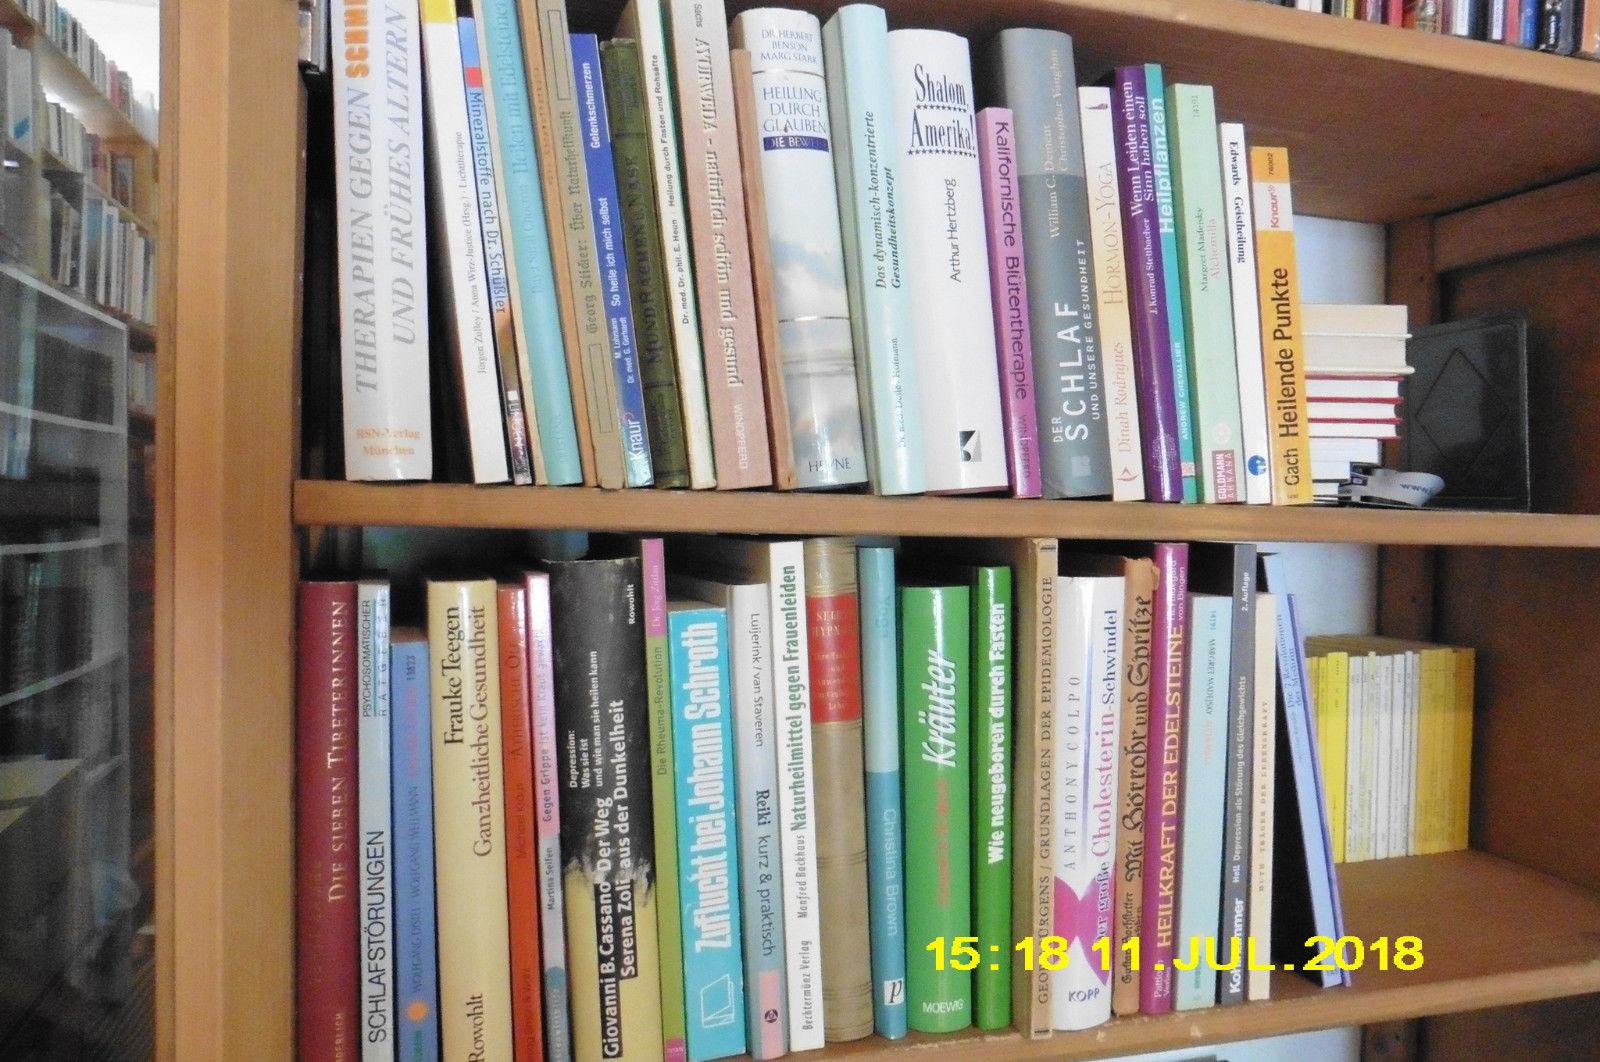 ca. 50 Bde Alternativ - Medizin, Konvolut 2